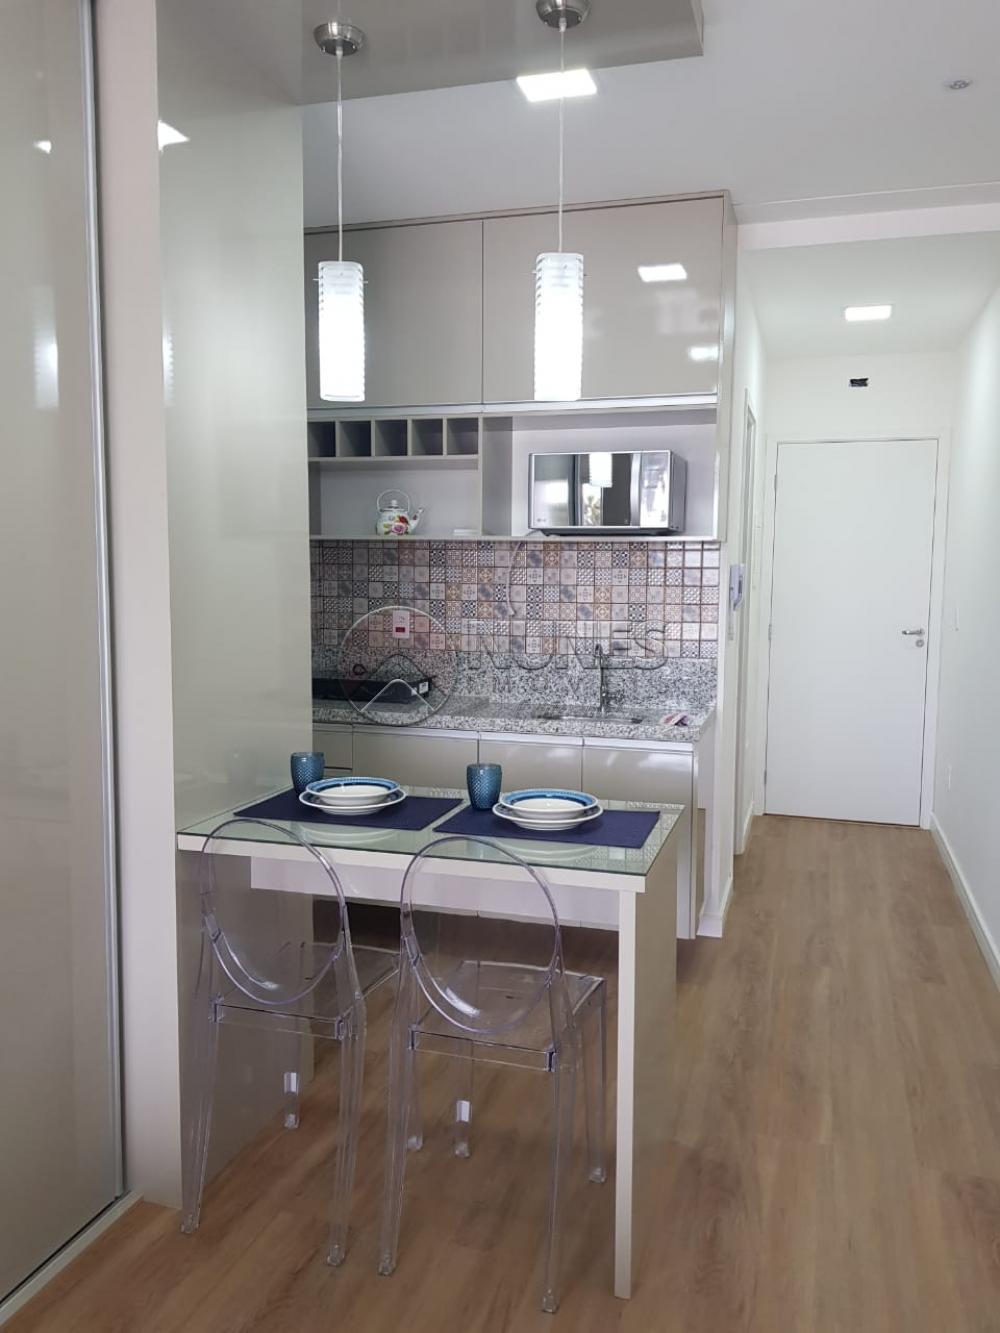 Comprar Apartamento / Flat em Cotia R$ 300.000,00 - Foto 7